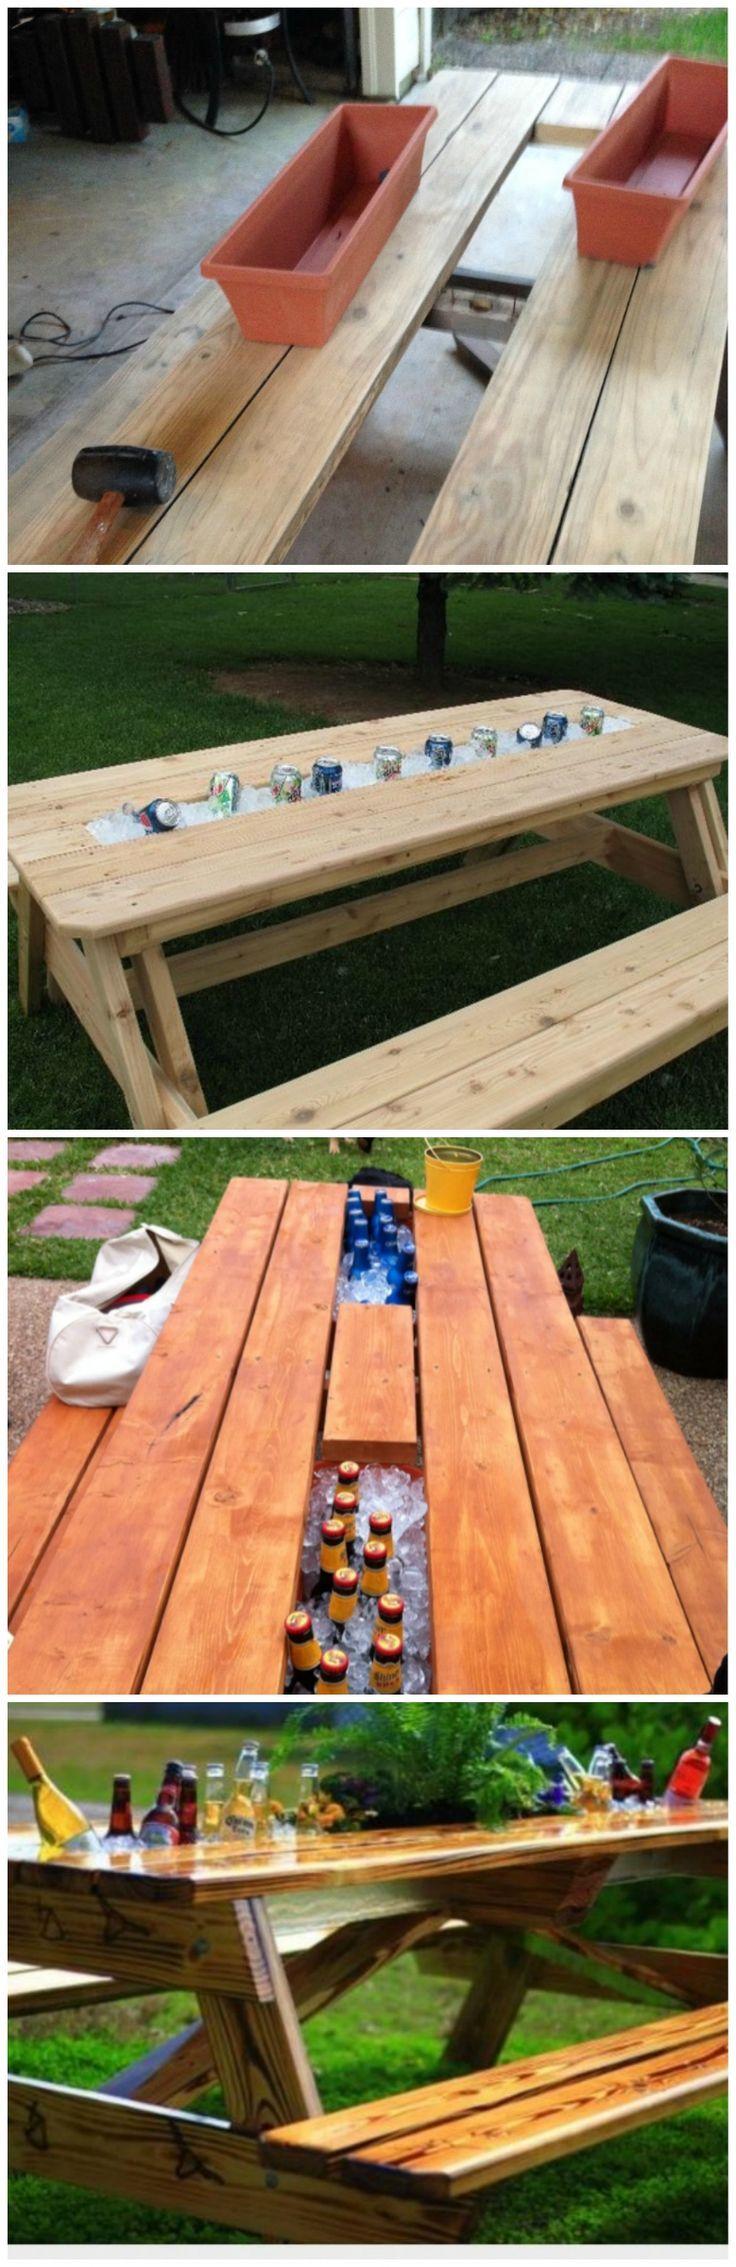 33 DIY Ideas That Will Make Your Backyard A Hangout Destination This Summer    OMG Facts   The Worldu0027s #1 Fact Source | SM House | Pinterest | DIY  Ideas, ...